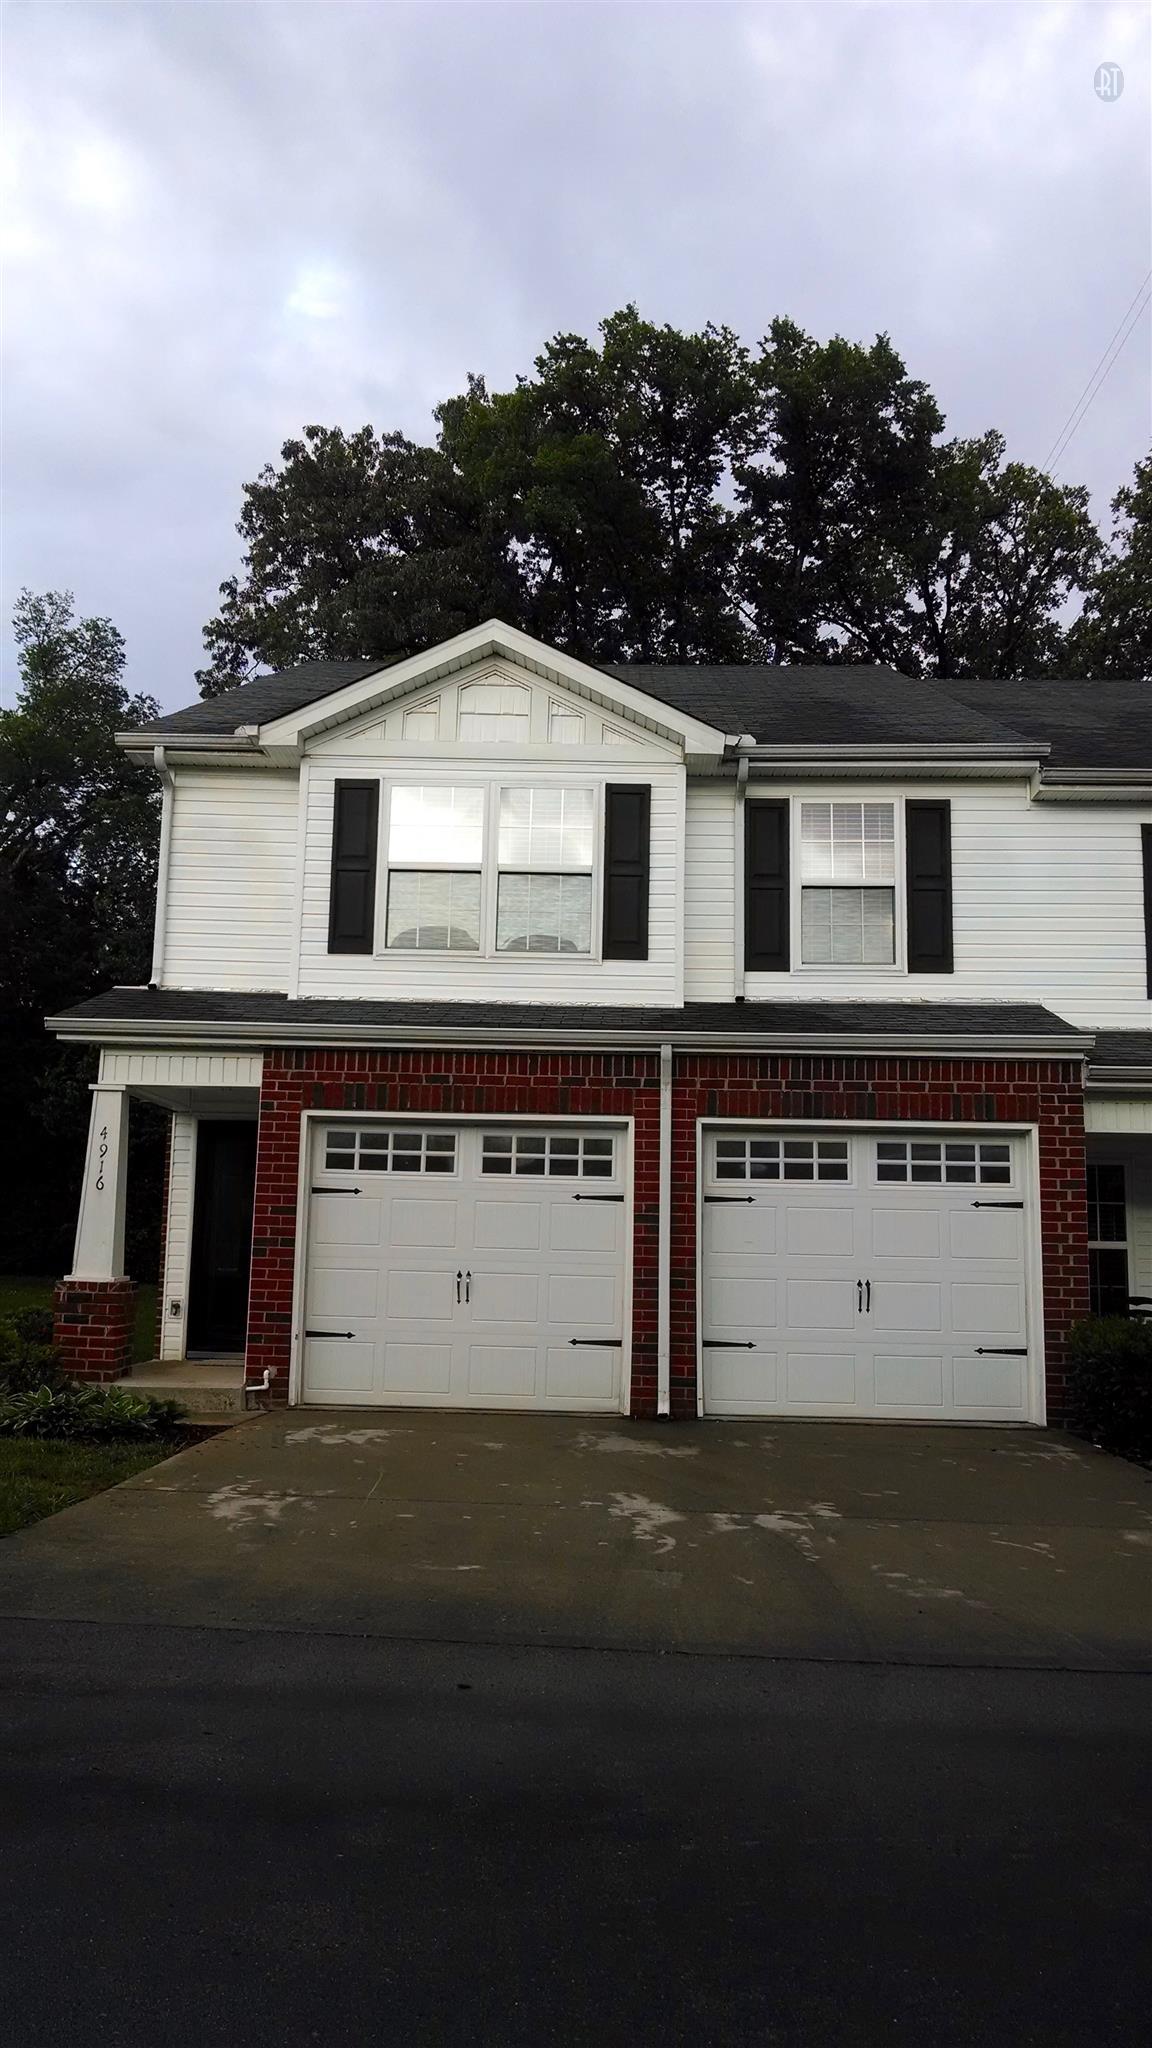 4916 Laura Jeanne Blvd, Murfreesboro, TN 37129